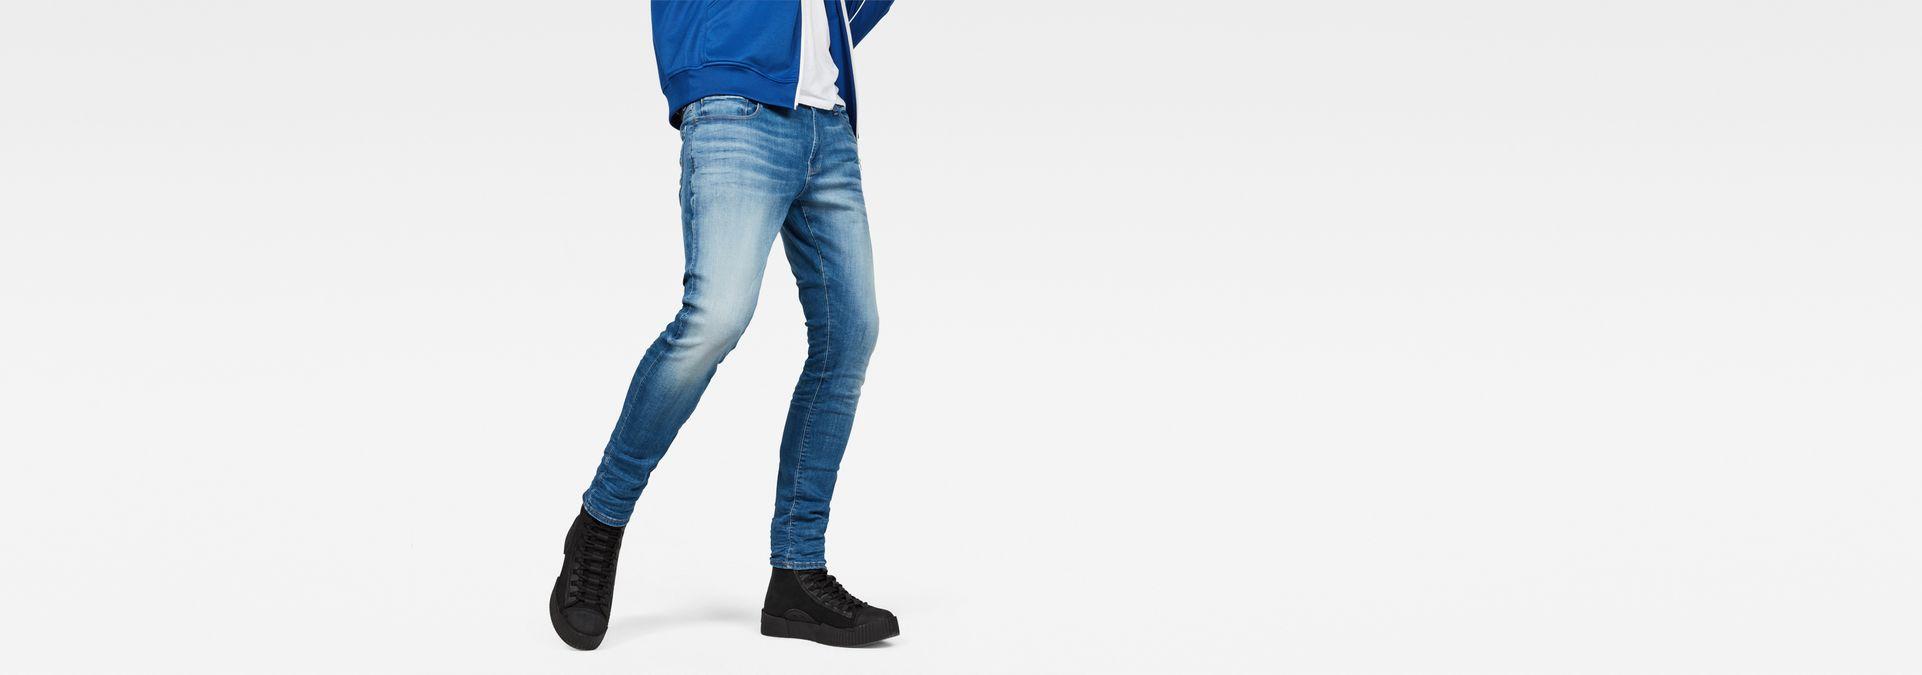 9cdecbb53bc G-Star RAW® 3301 Deconstructed Super Slim Jeans Medium blue ...